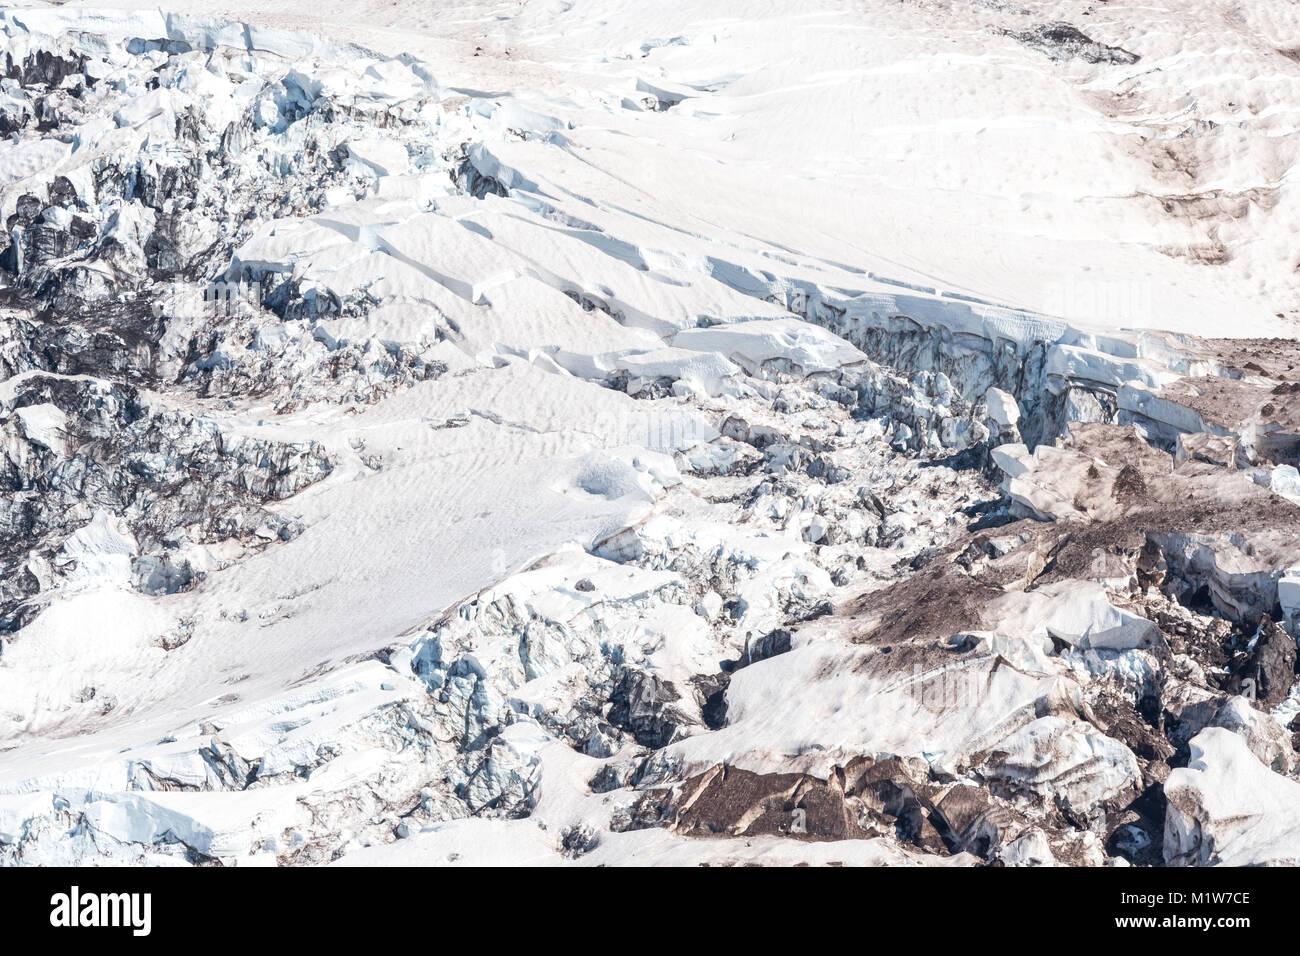 Glacier on Mount Rainier collapsing during summer - Stock Image